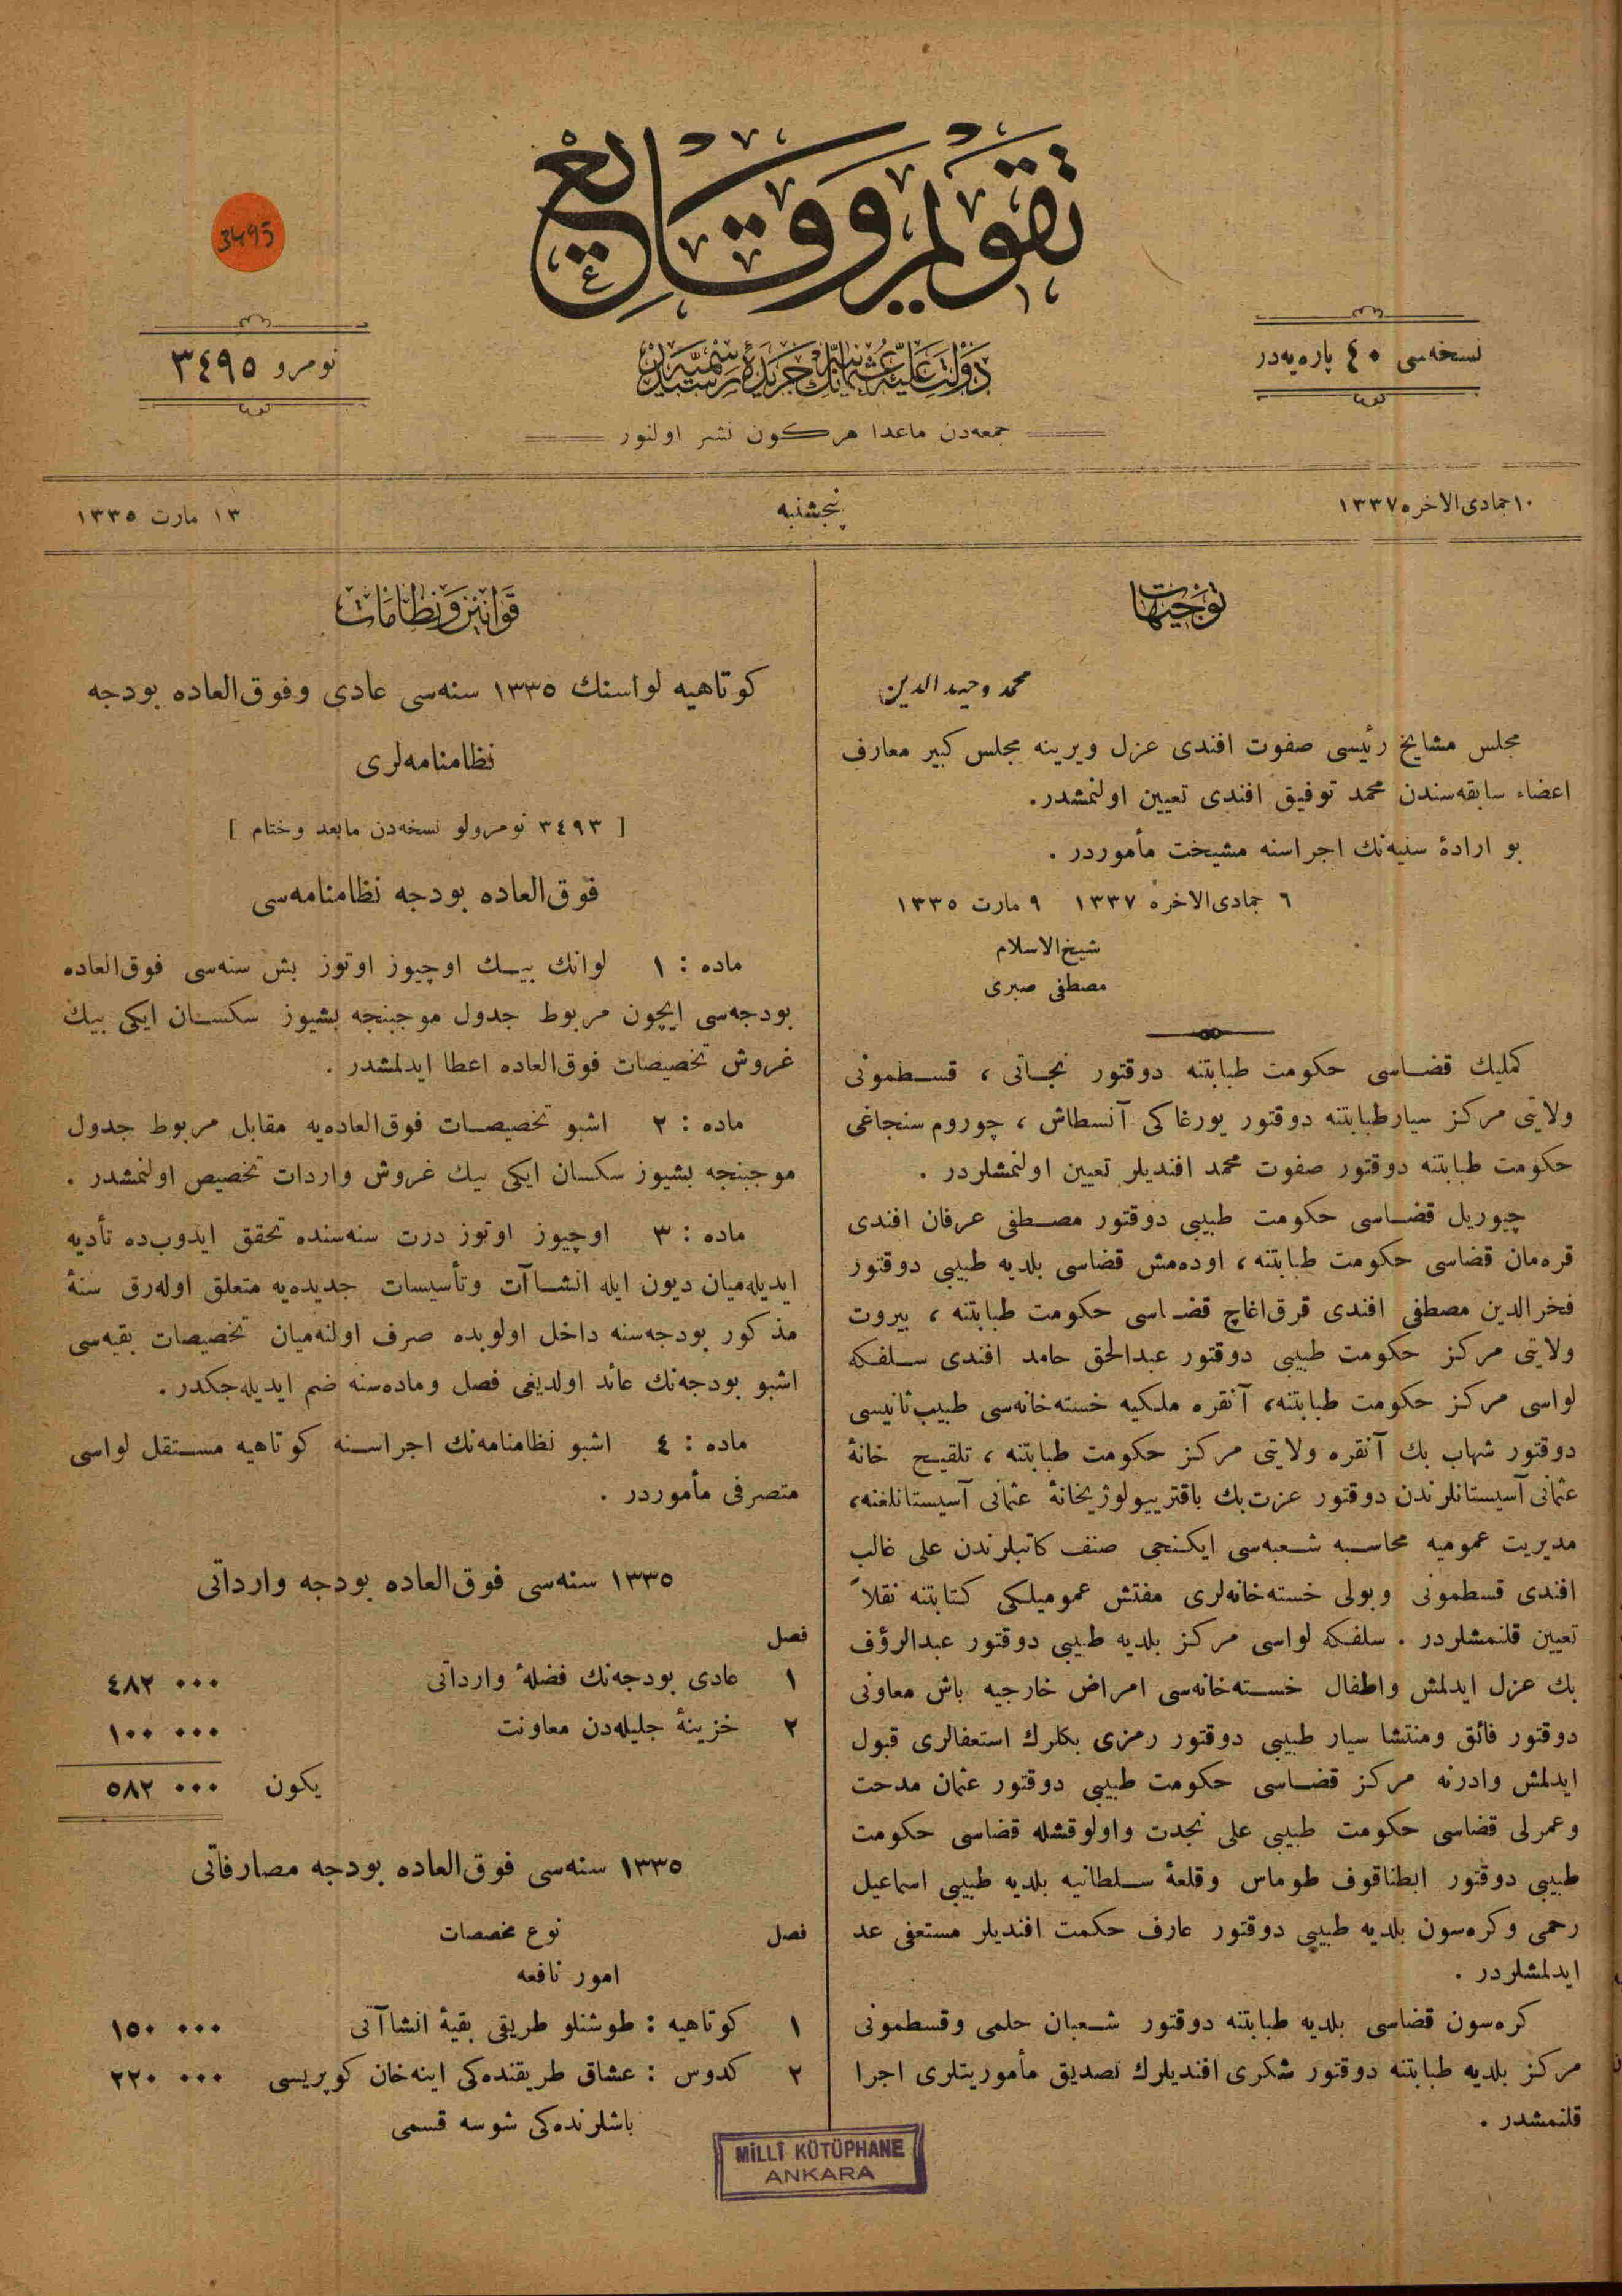 13 Mart 1919 Tarihli Takvim-i Vekayi Gazetesi Sayfa 1